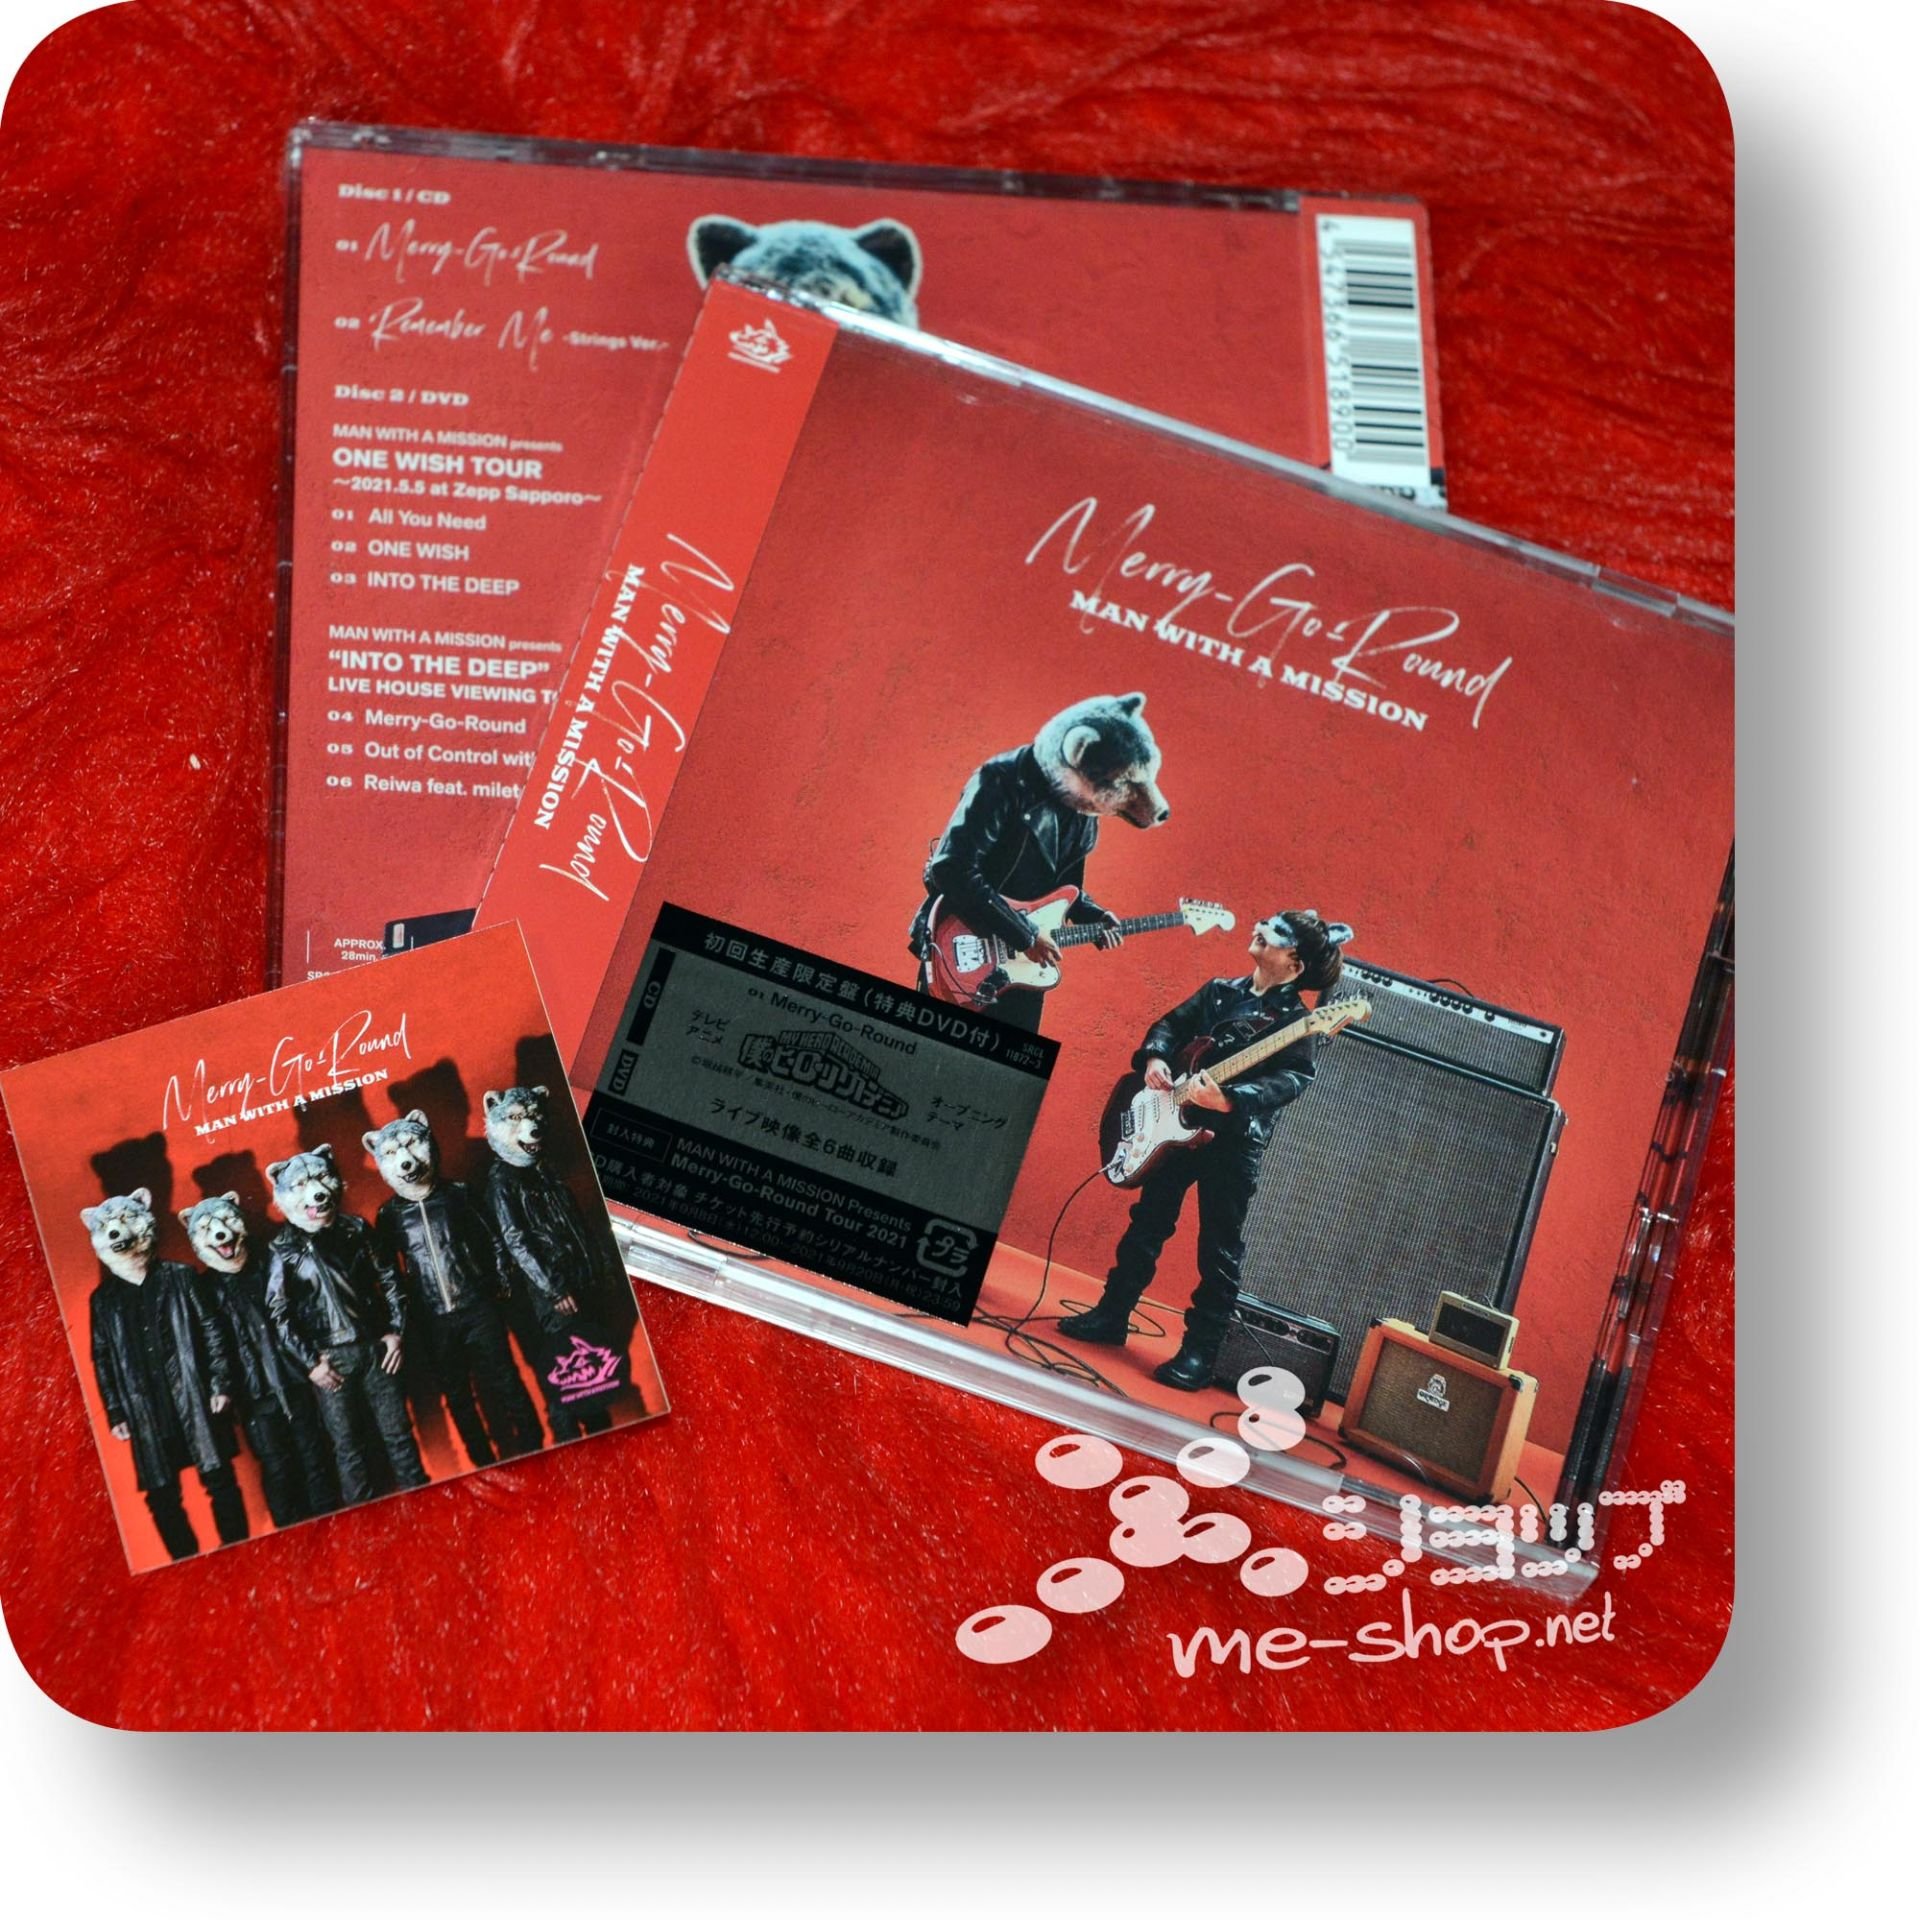 man with a mission merry cd+dvd+bonus